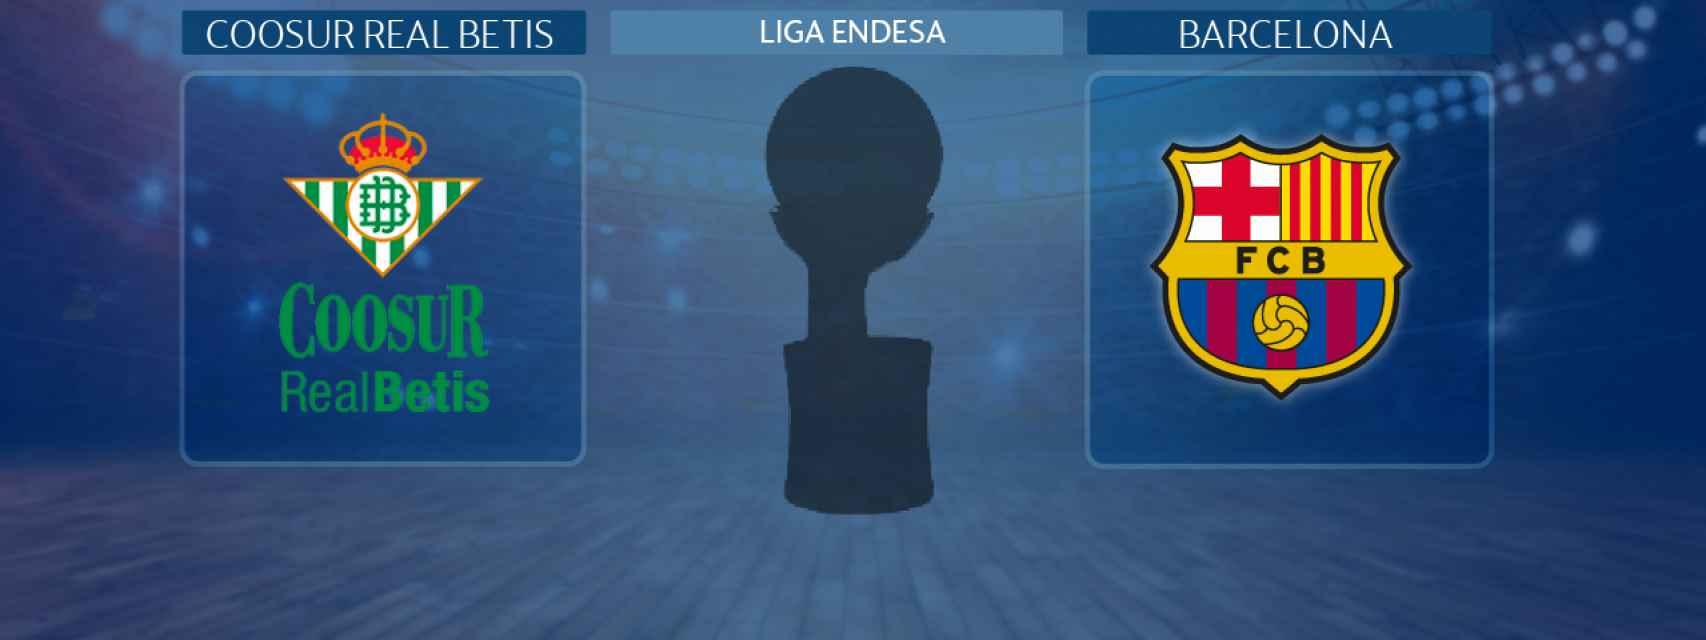 Coosur Real Betis - Barcelona, partido de la Liga Endesa